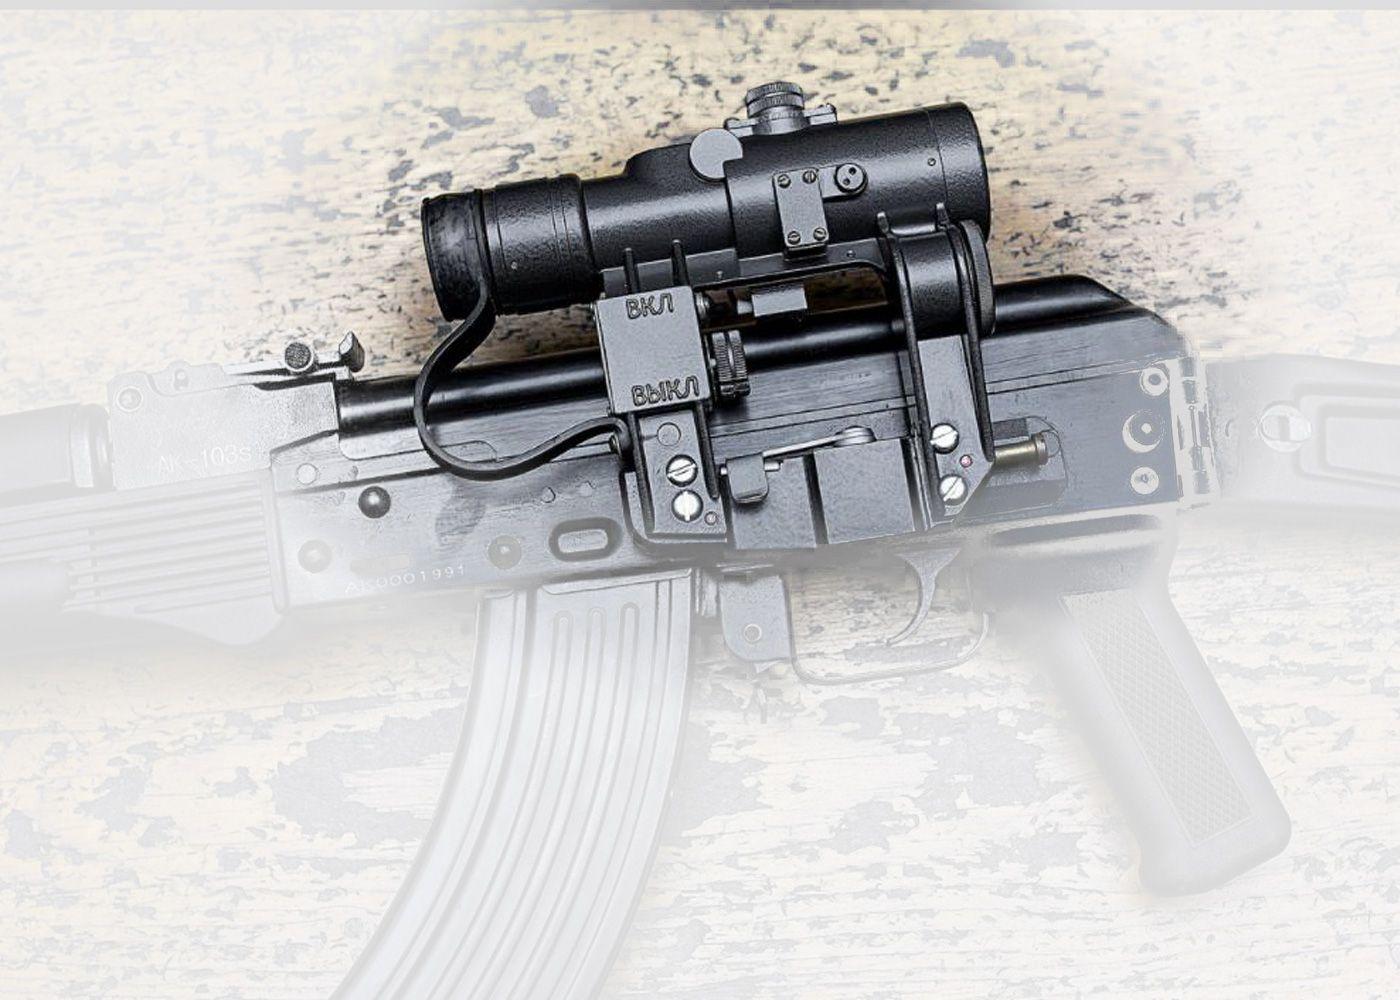 Vector Optics Ak74 Ak47 Svd Dragunov 1x28 Red Dot Scope Airsoft